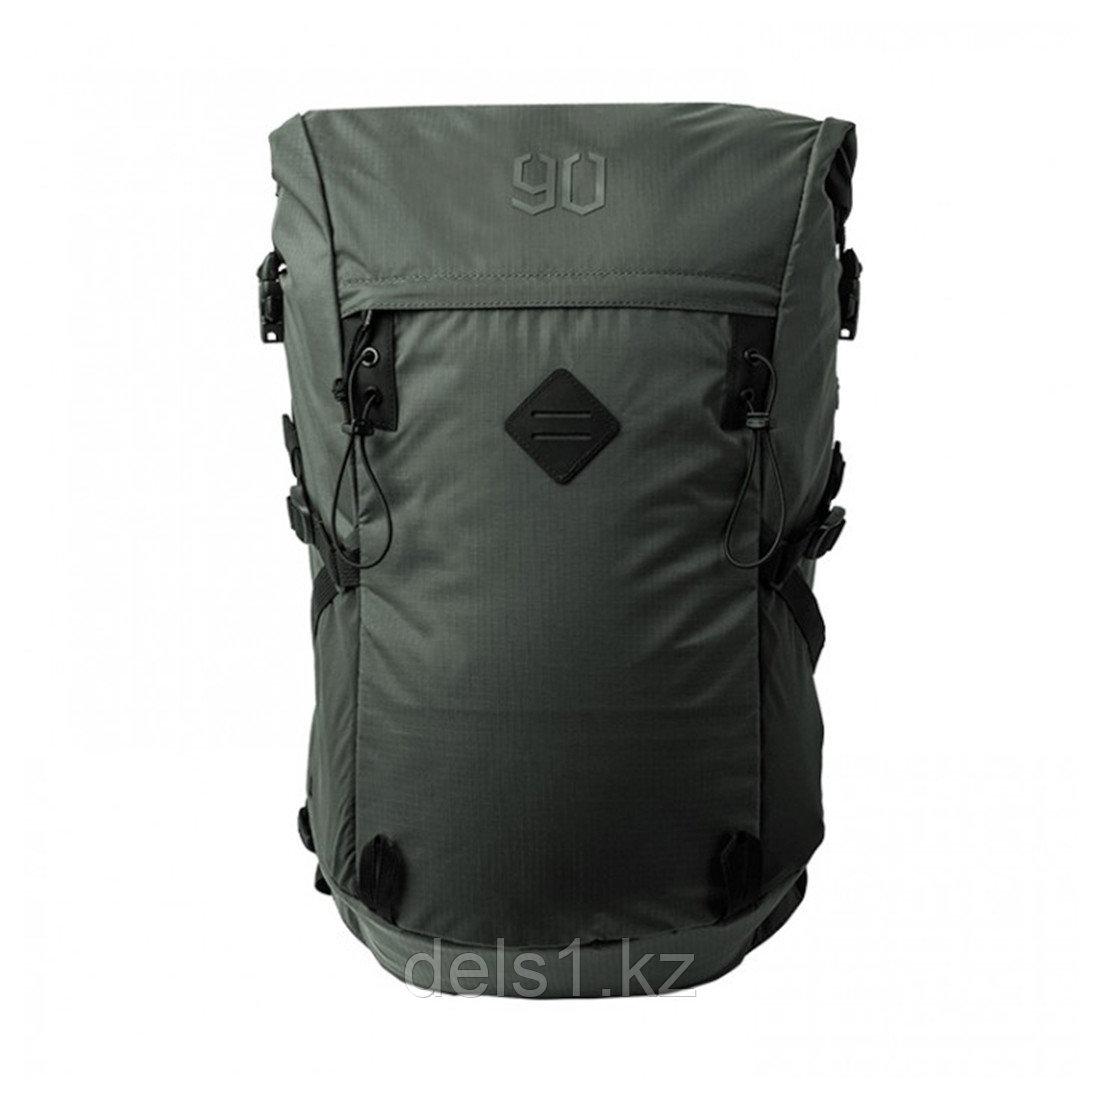 Рюкзак Xiaomi 90 Points HIKE outdoor Backpack Зеленый